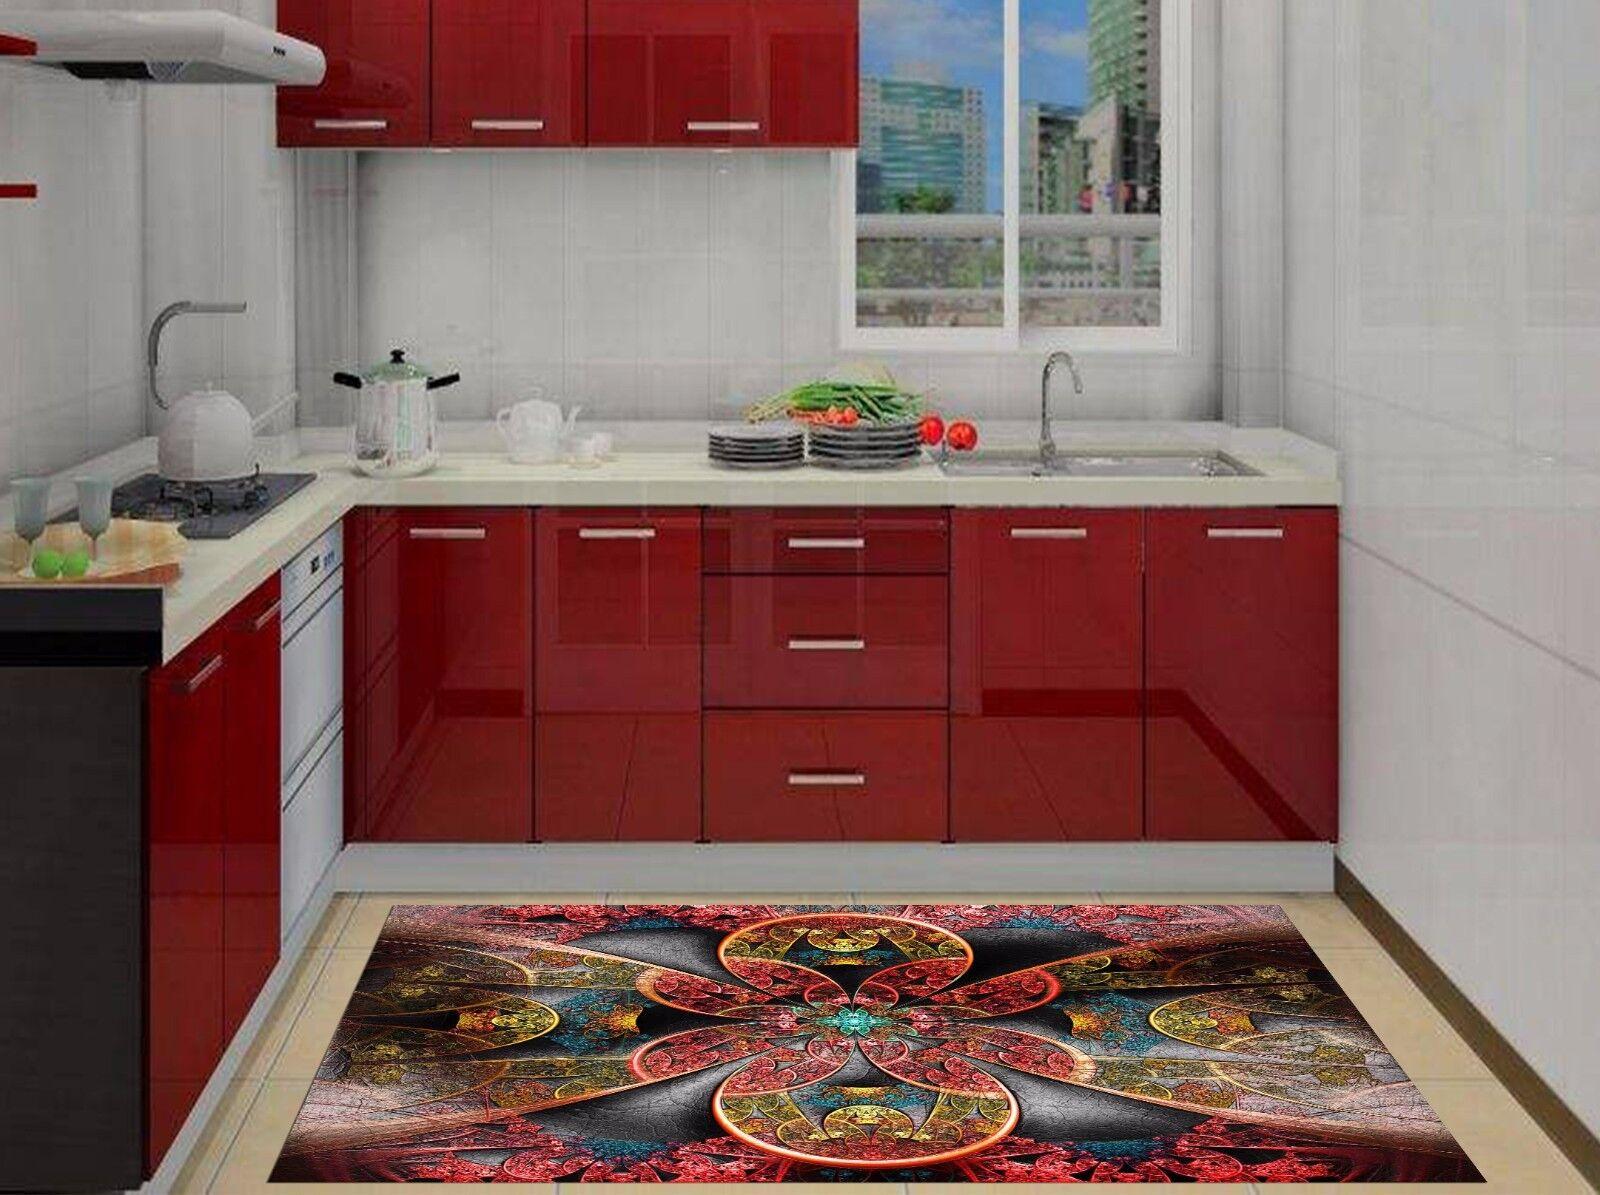 3D ROT Texture 78 Kitchen Mat Floor Murals Wall Print Wall AJ WALLPAPER AU Carly